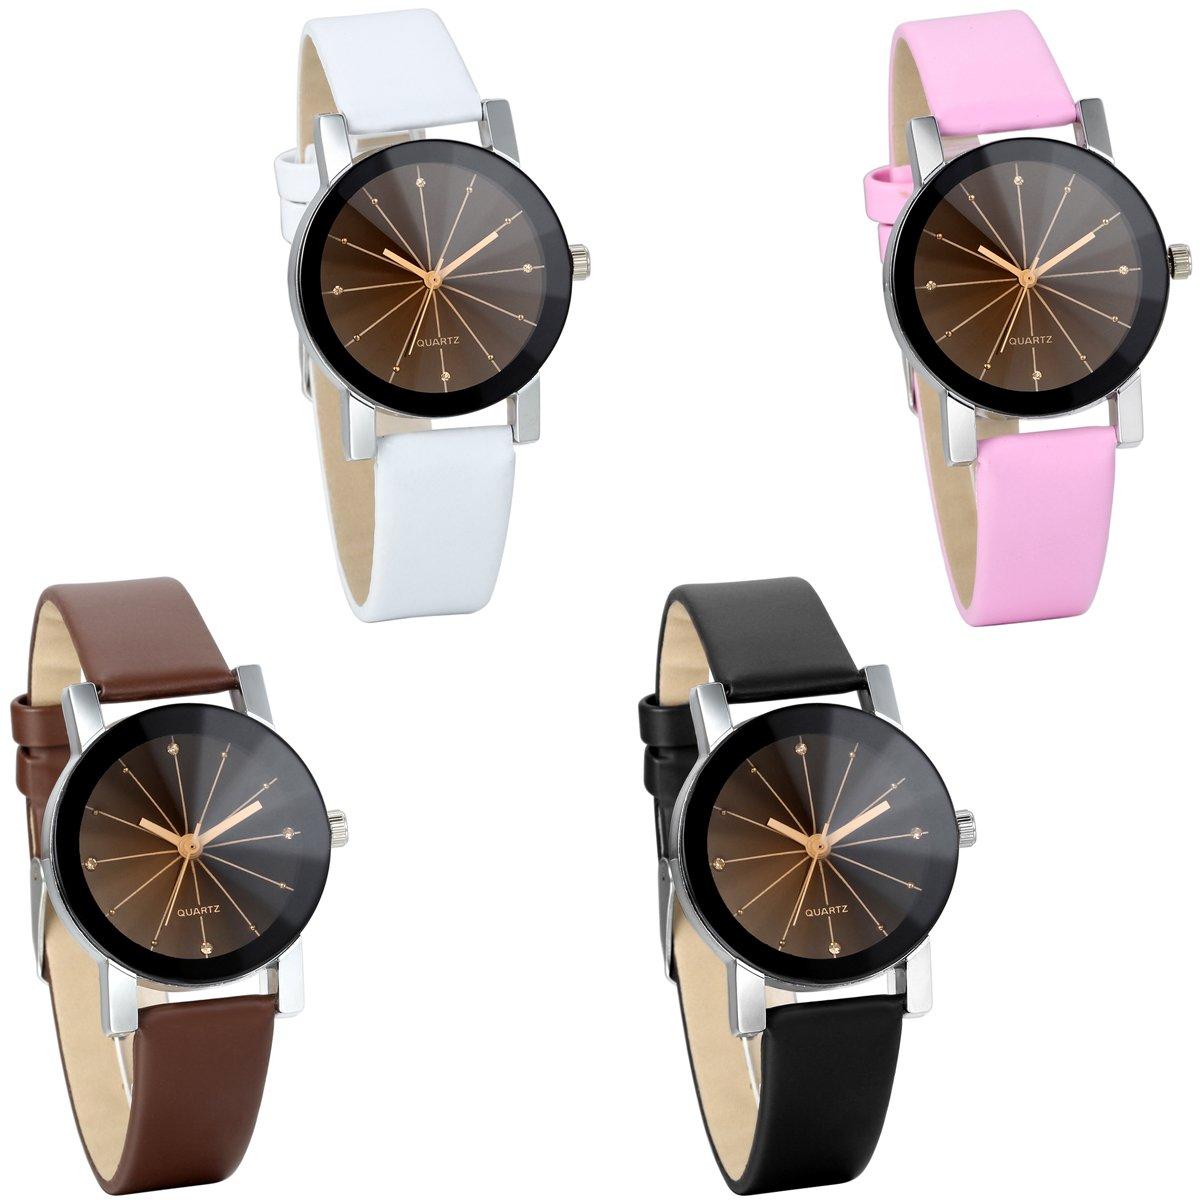 JewelryWe-Damen-Armbanduhr-Analog-Quarz-Klassiker-Elegant-Business-Casual-Uhr-mit-Schwarz-Rund-Zifferblatt-Leder-Armband-4-Farben